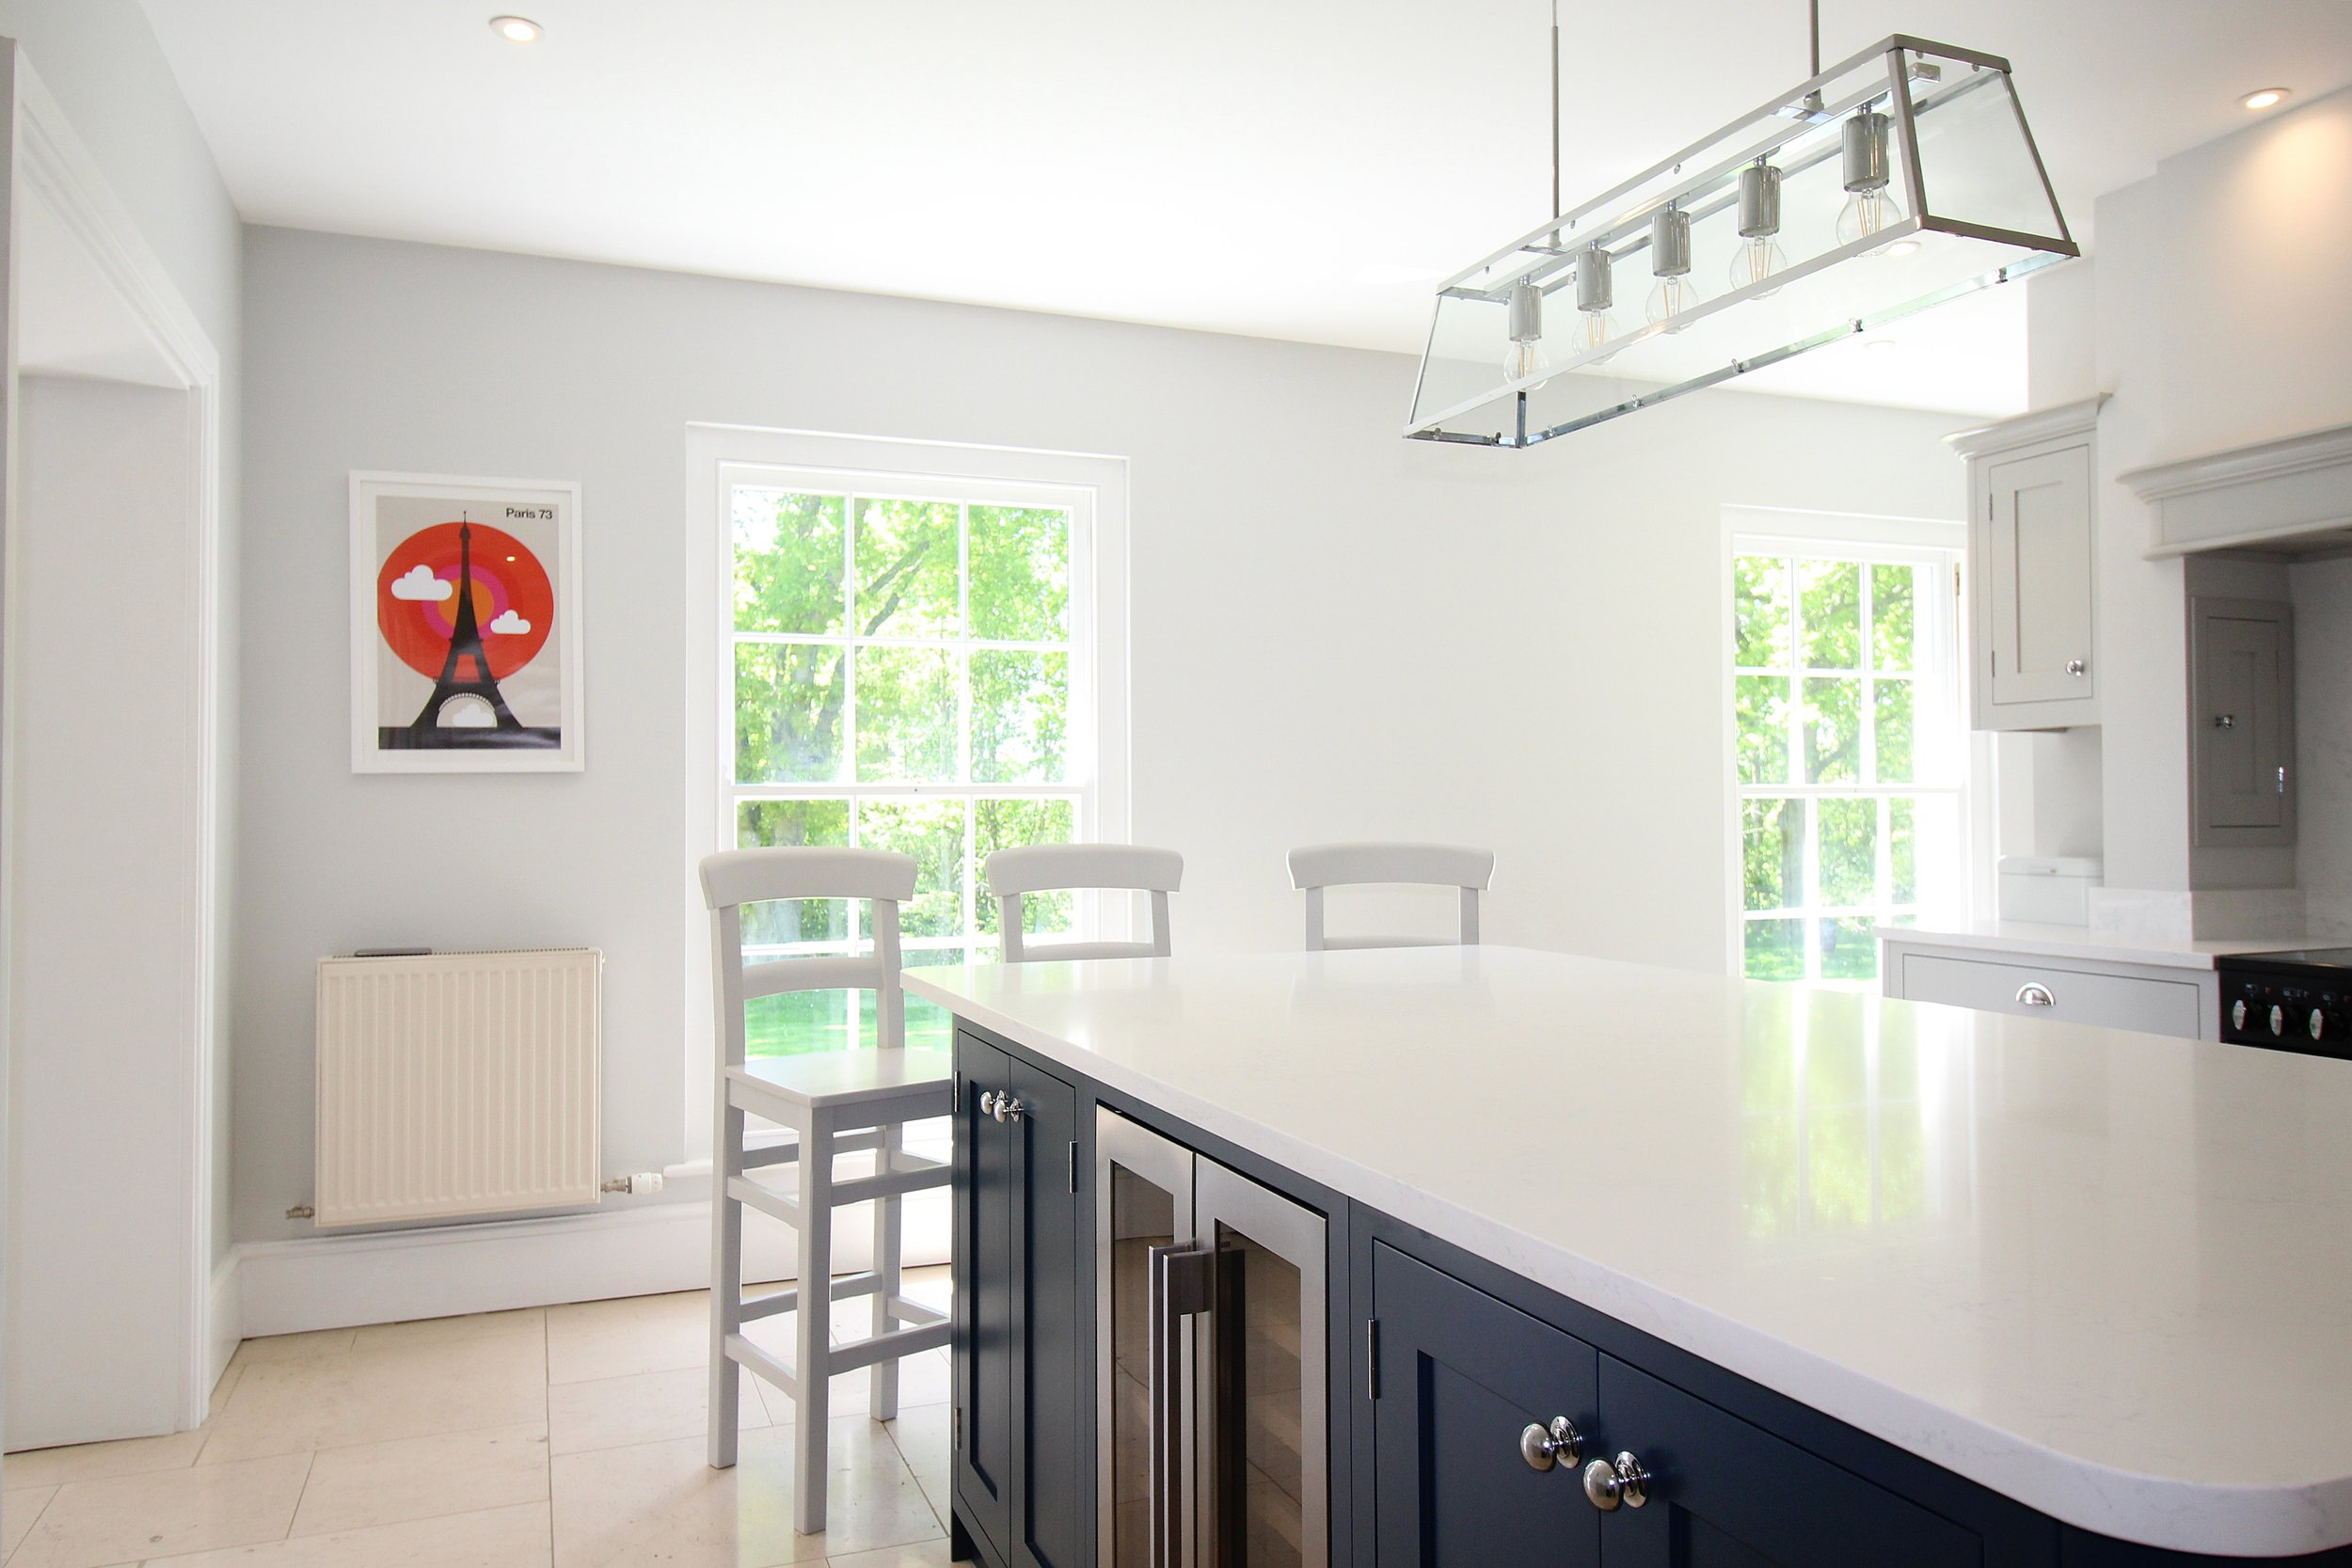 Norton-house-collins-bespoke-kitchen